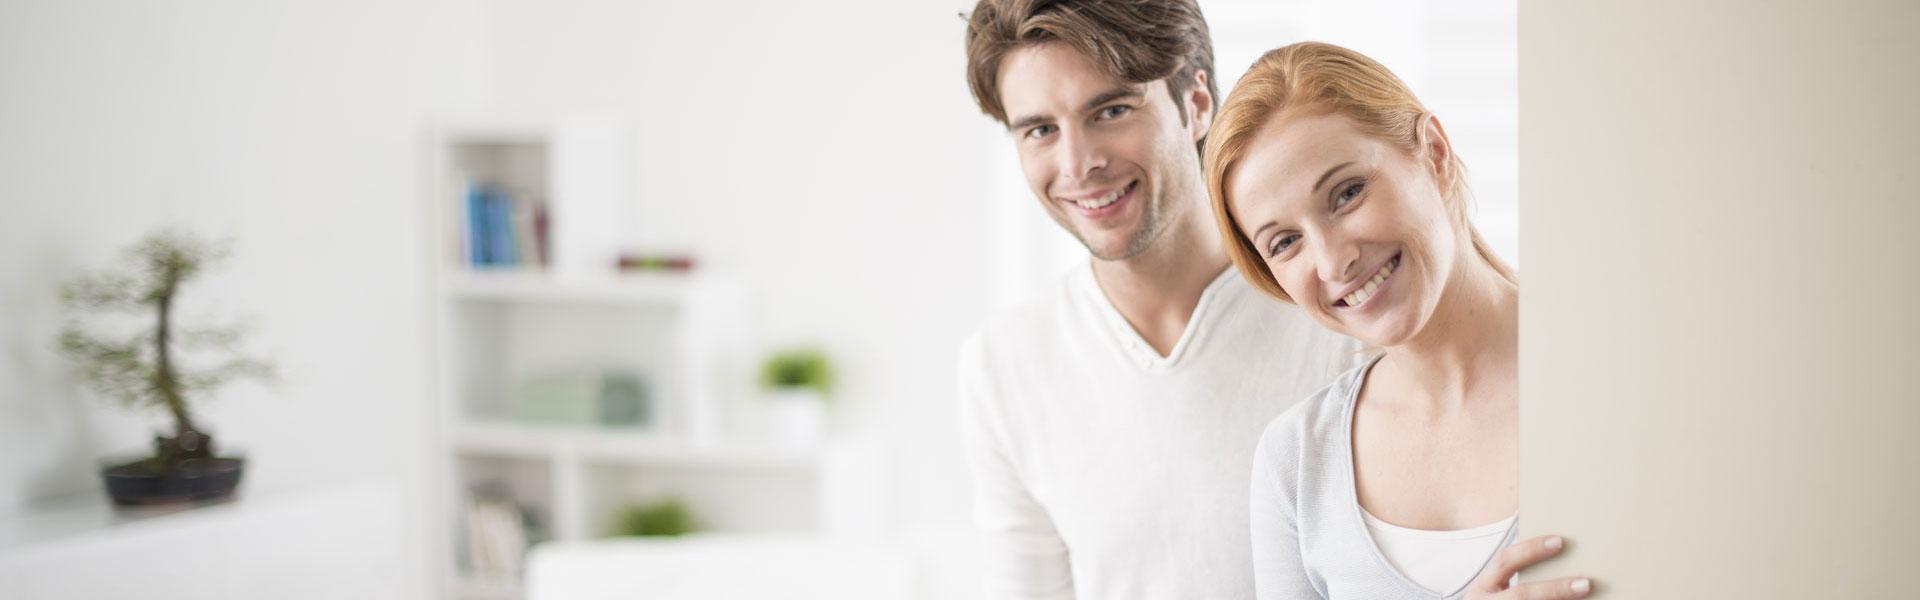 Traun Dating Plattform Enns - Singles Partnersuche Imst